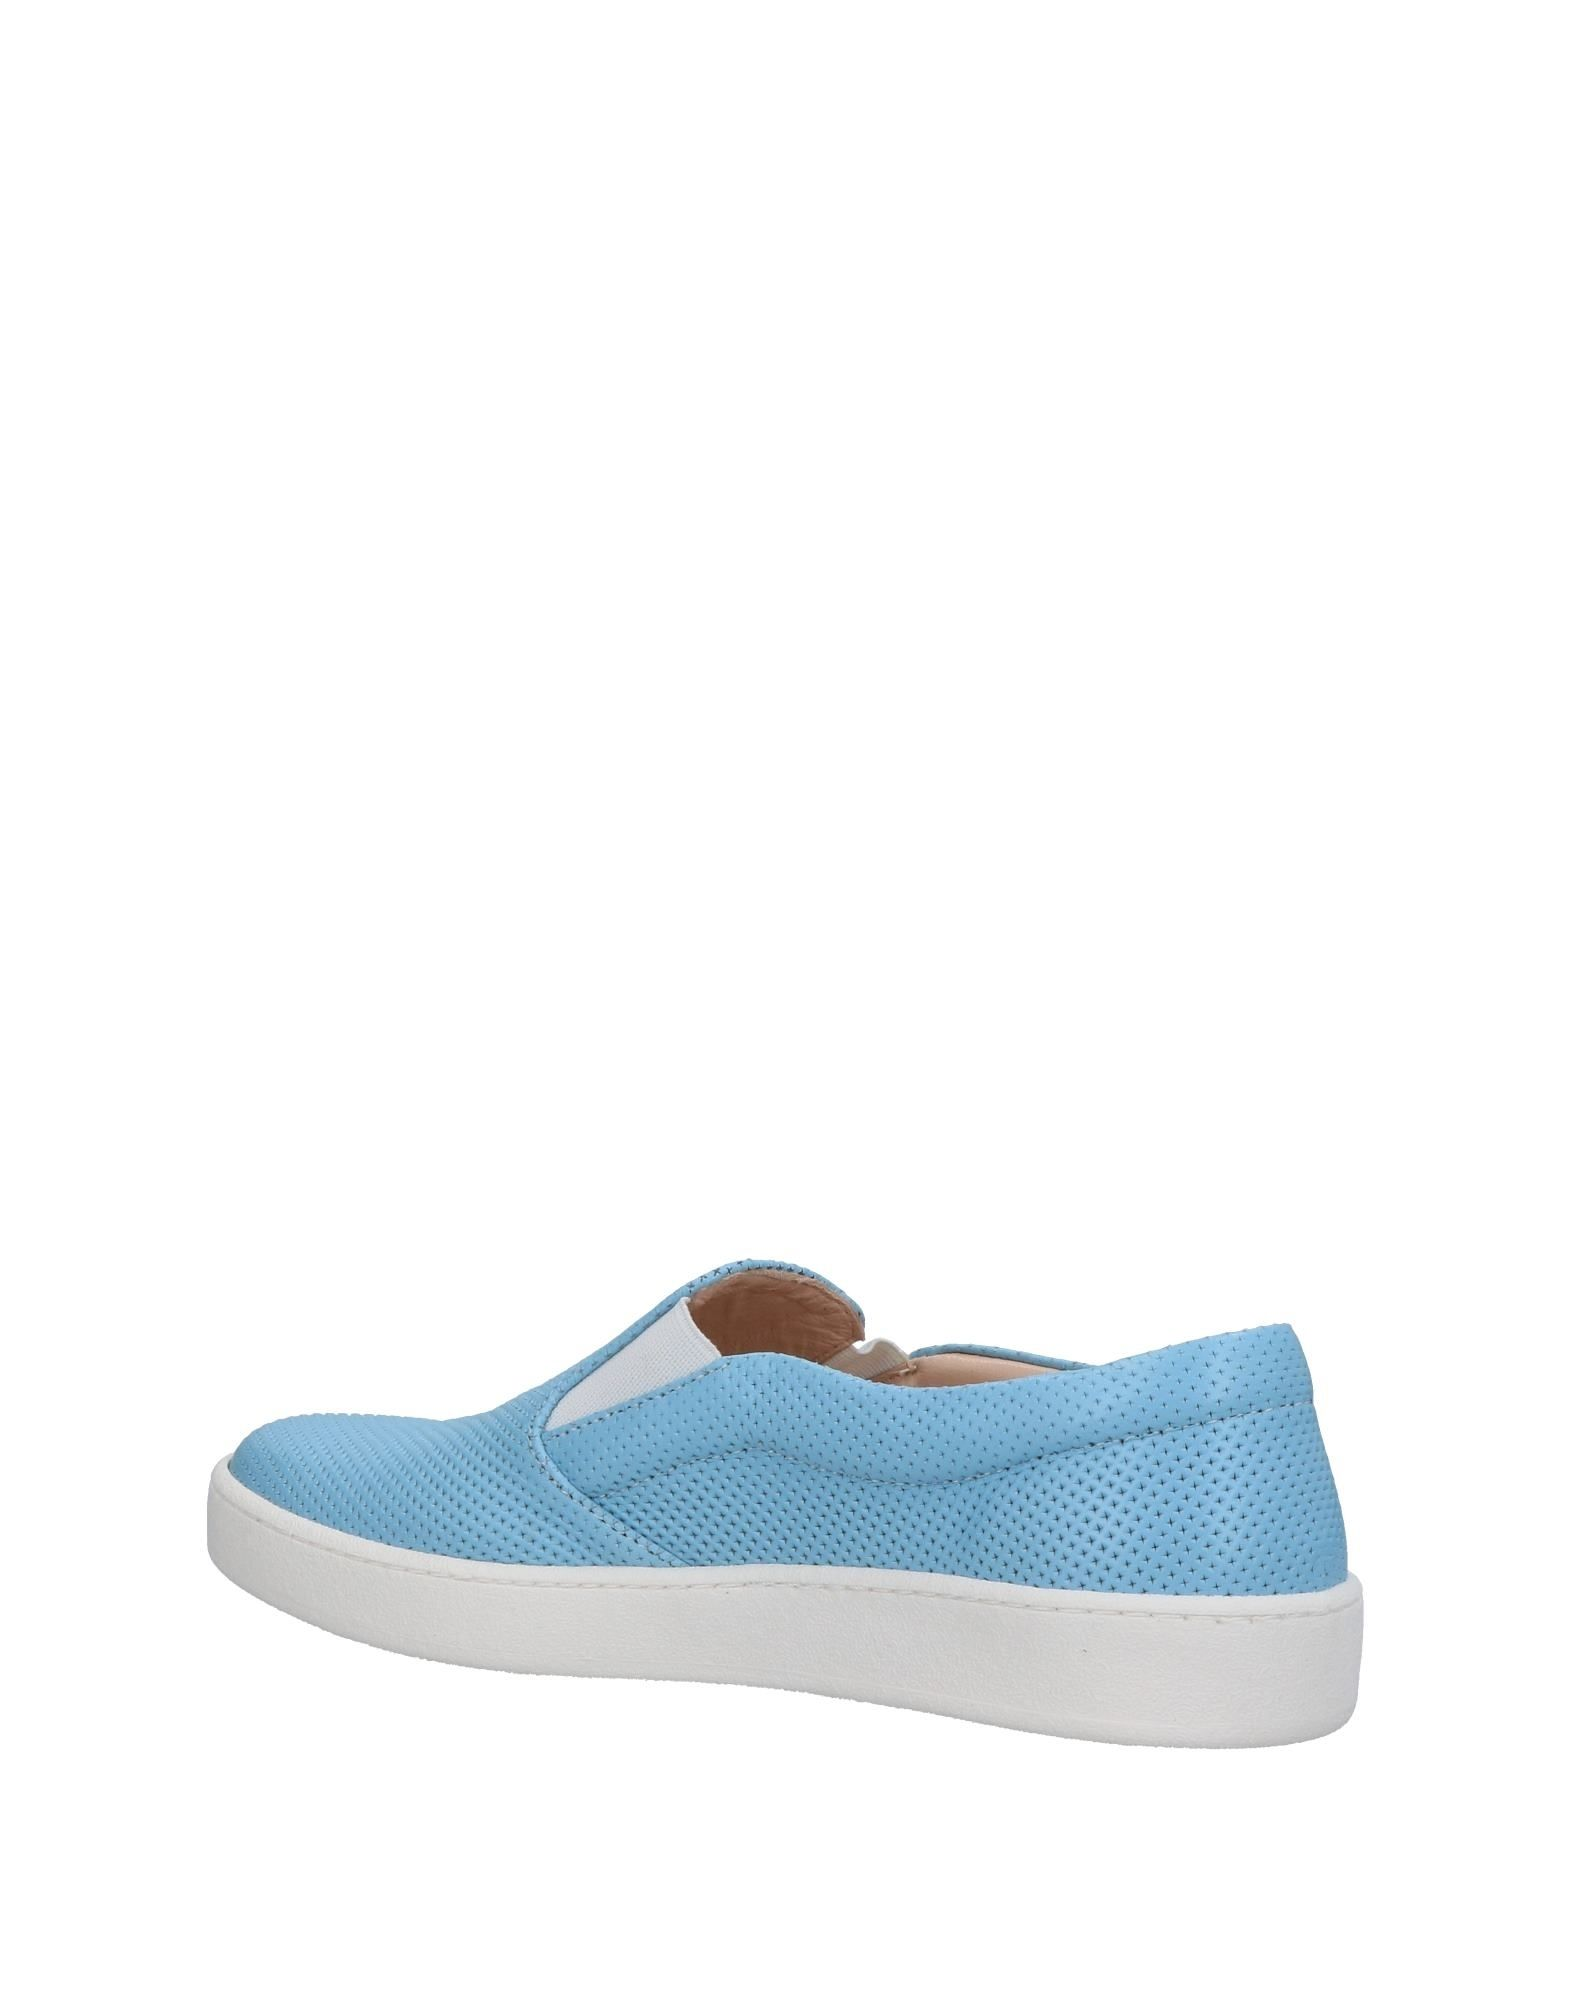 Carlo Pazolini Sneakers Sneakers Pazolini Damen  11407486IR 6a56d7